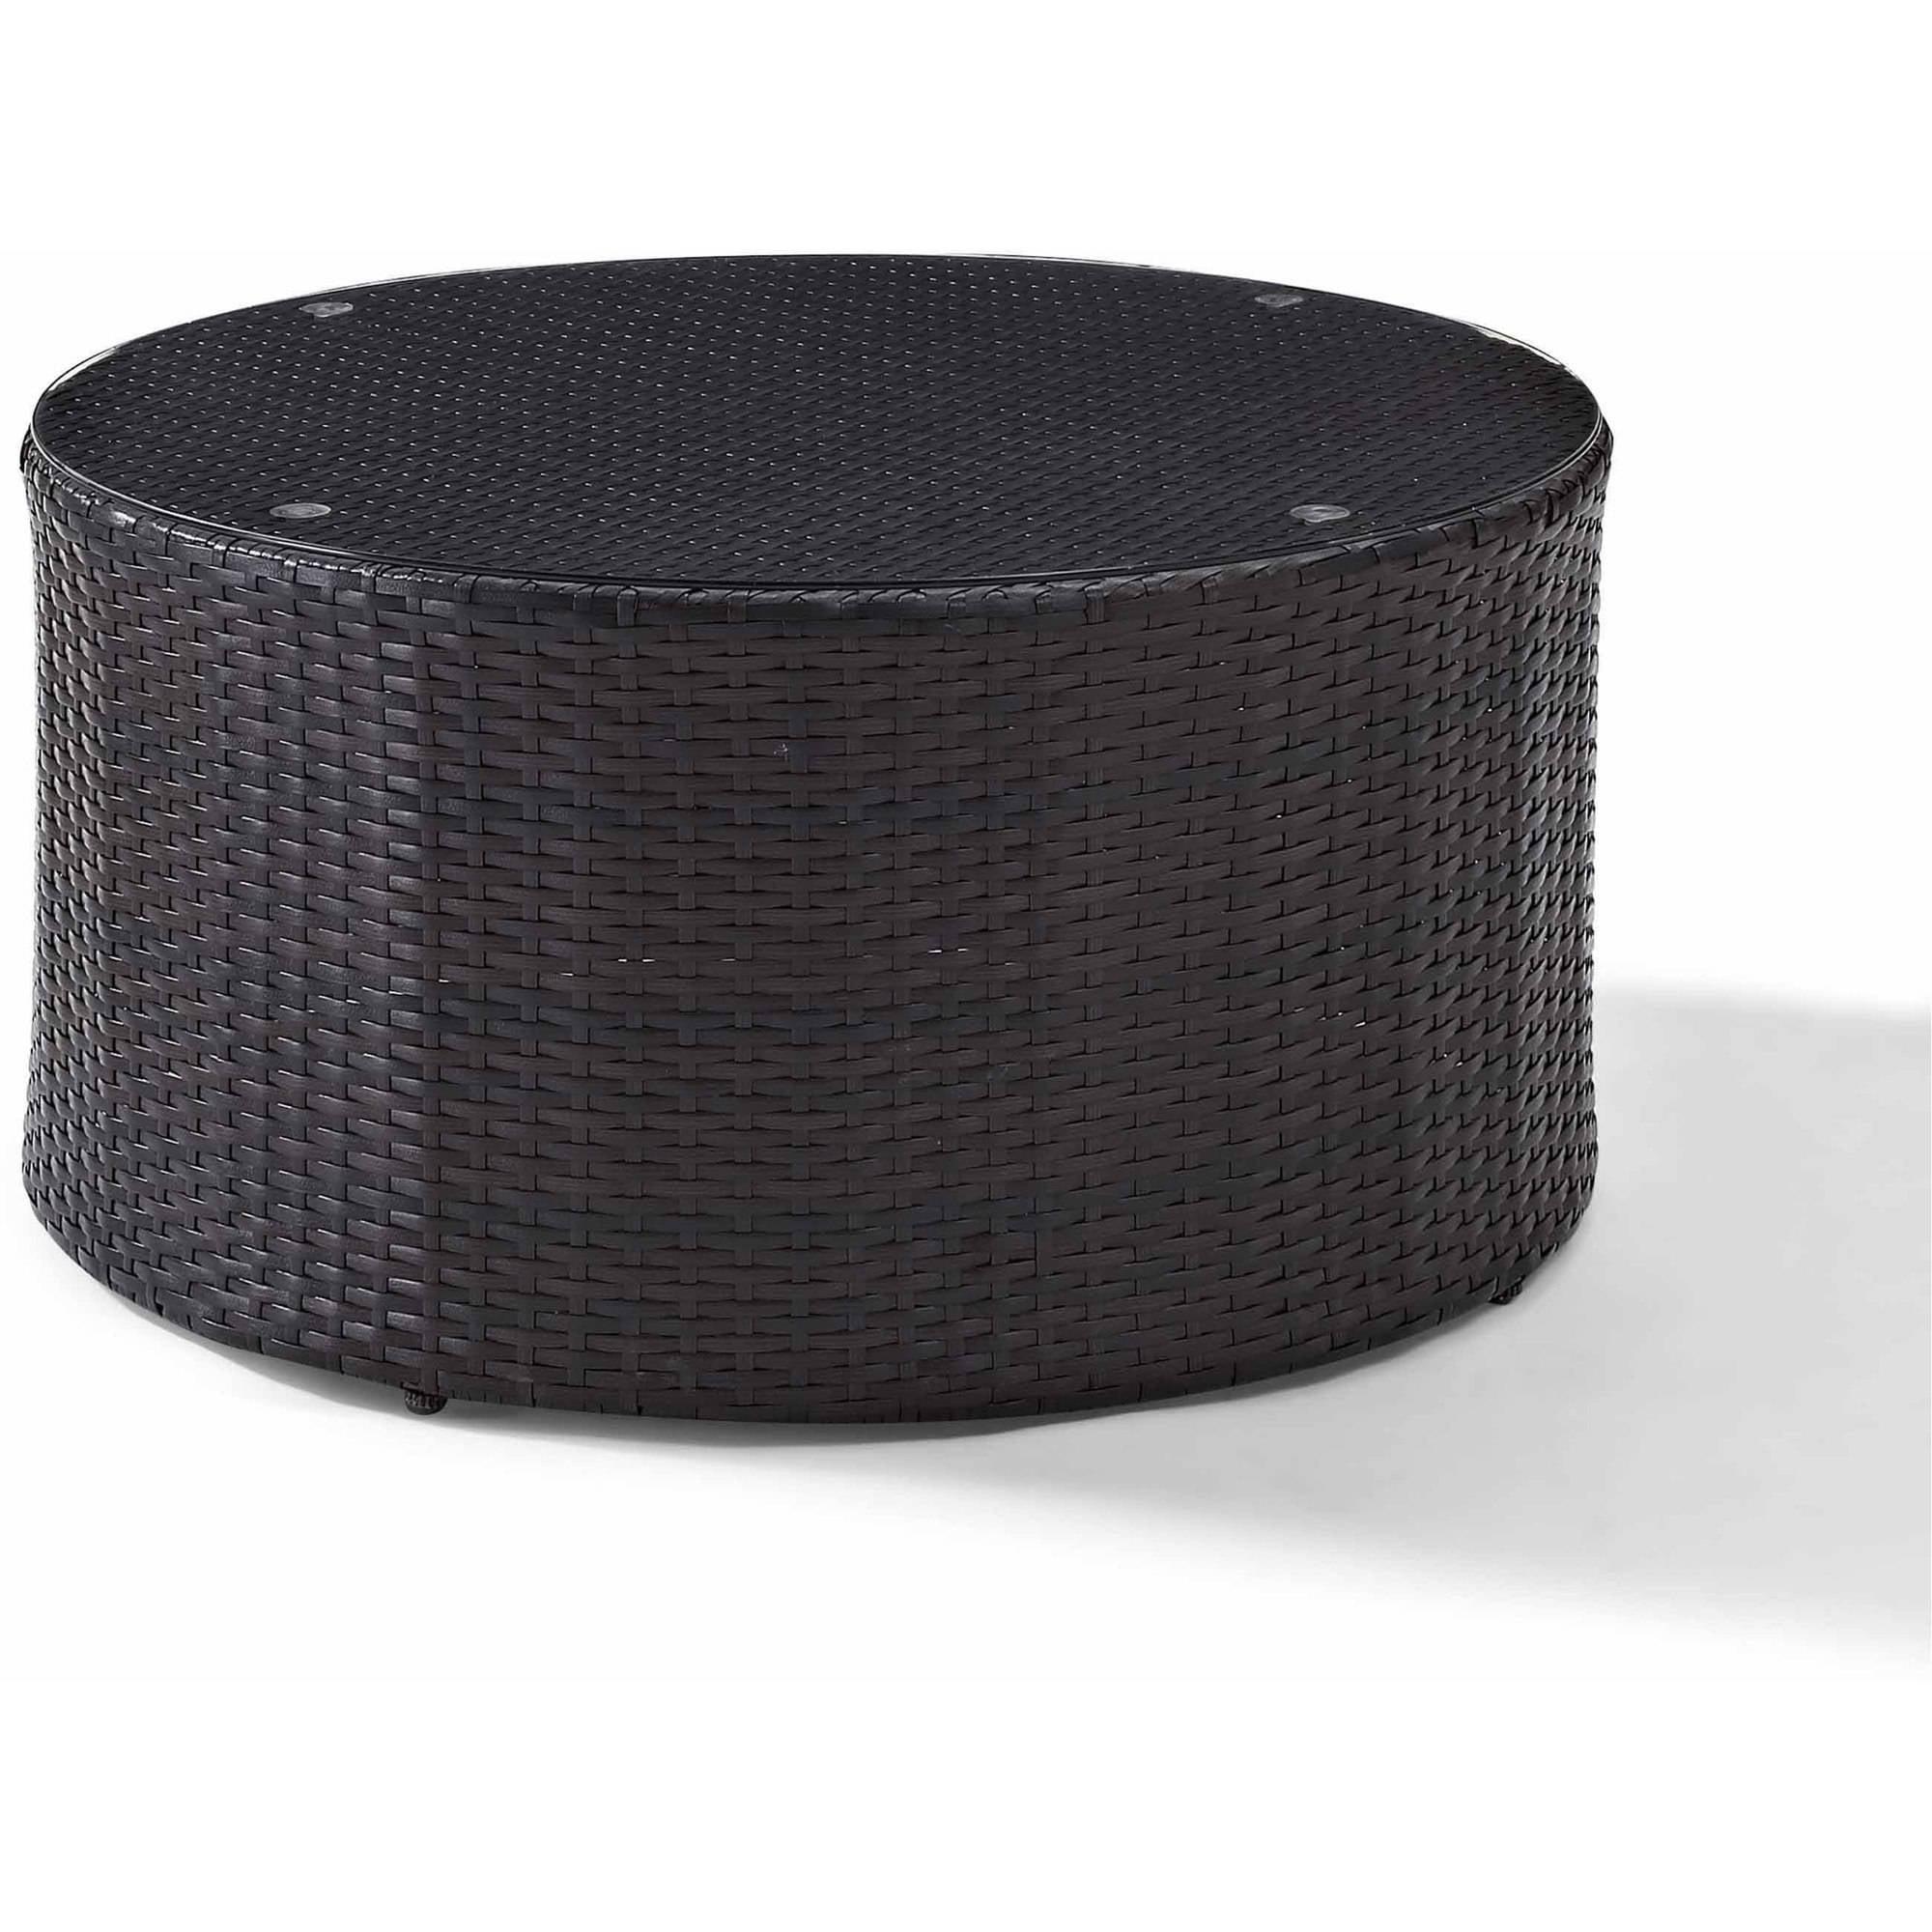 Crosley Furniture Catalina Outdoor Wicker Round GlassTop Coffee